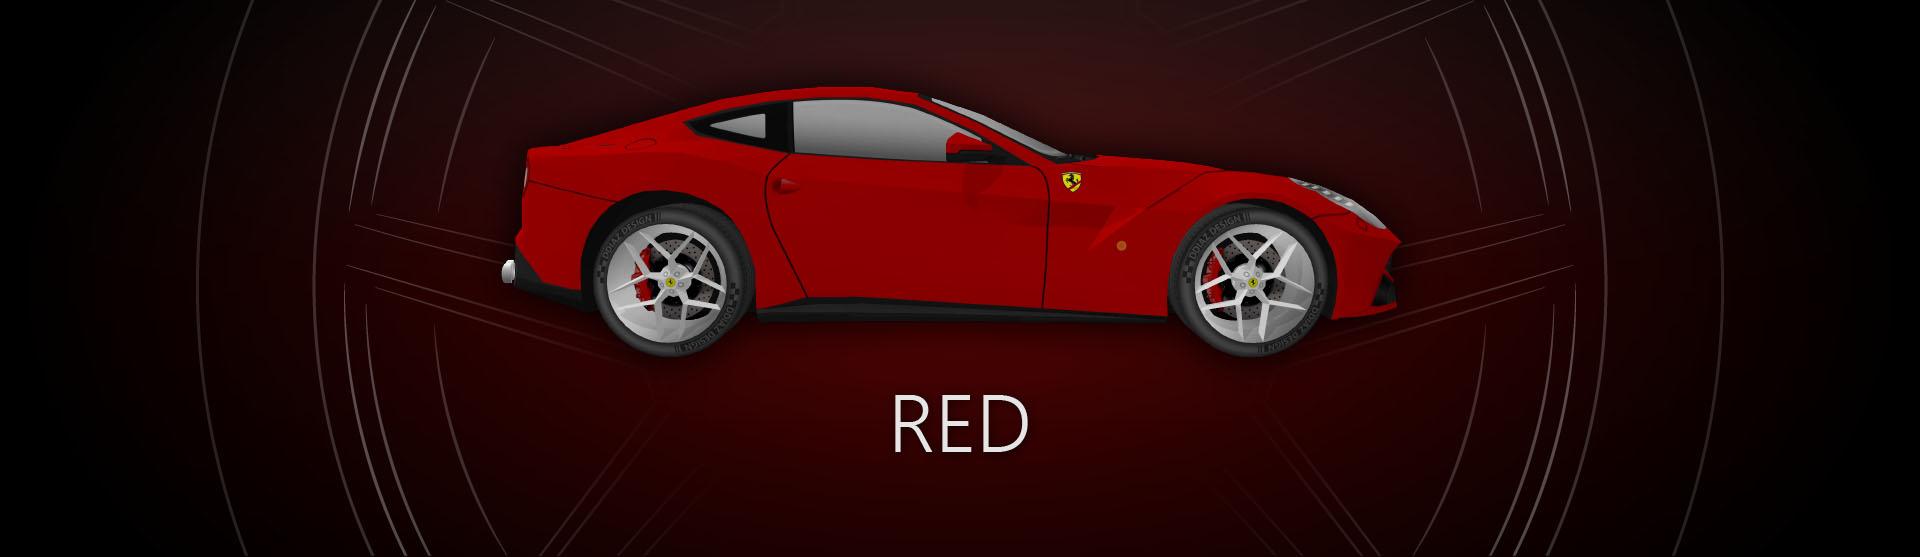 F12 Download Color